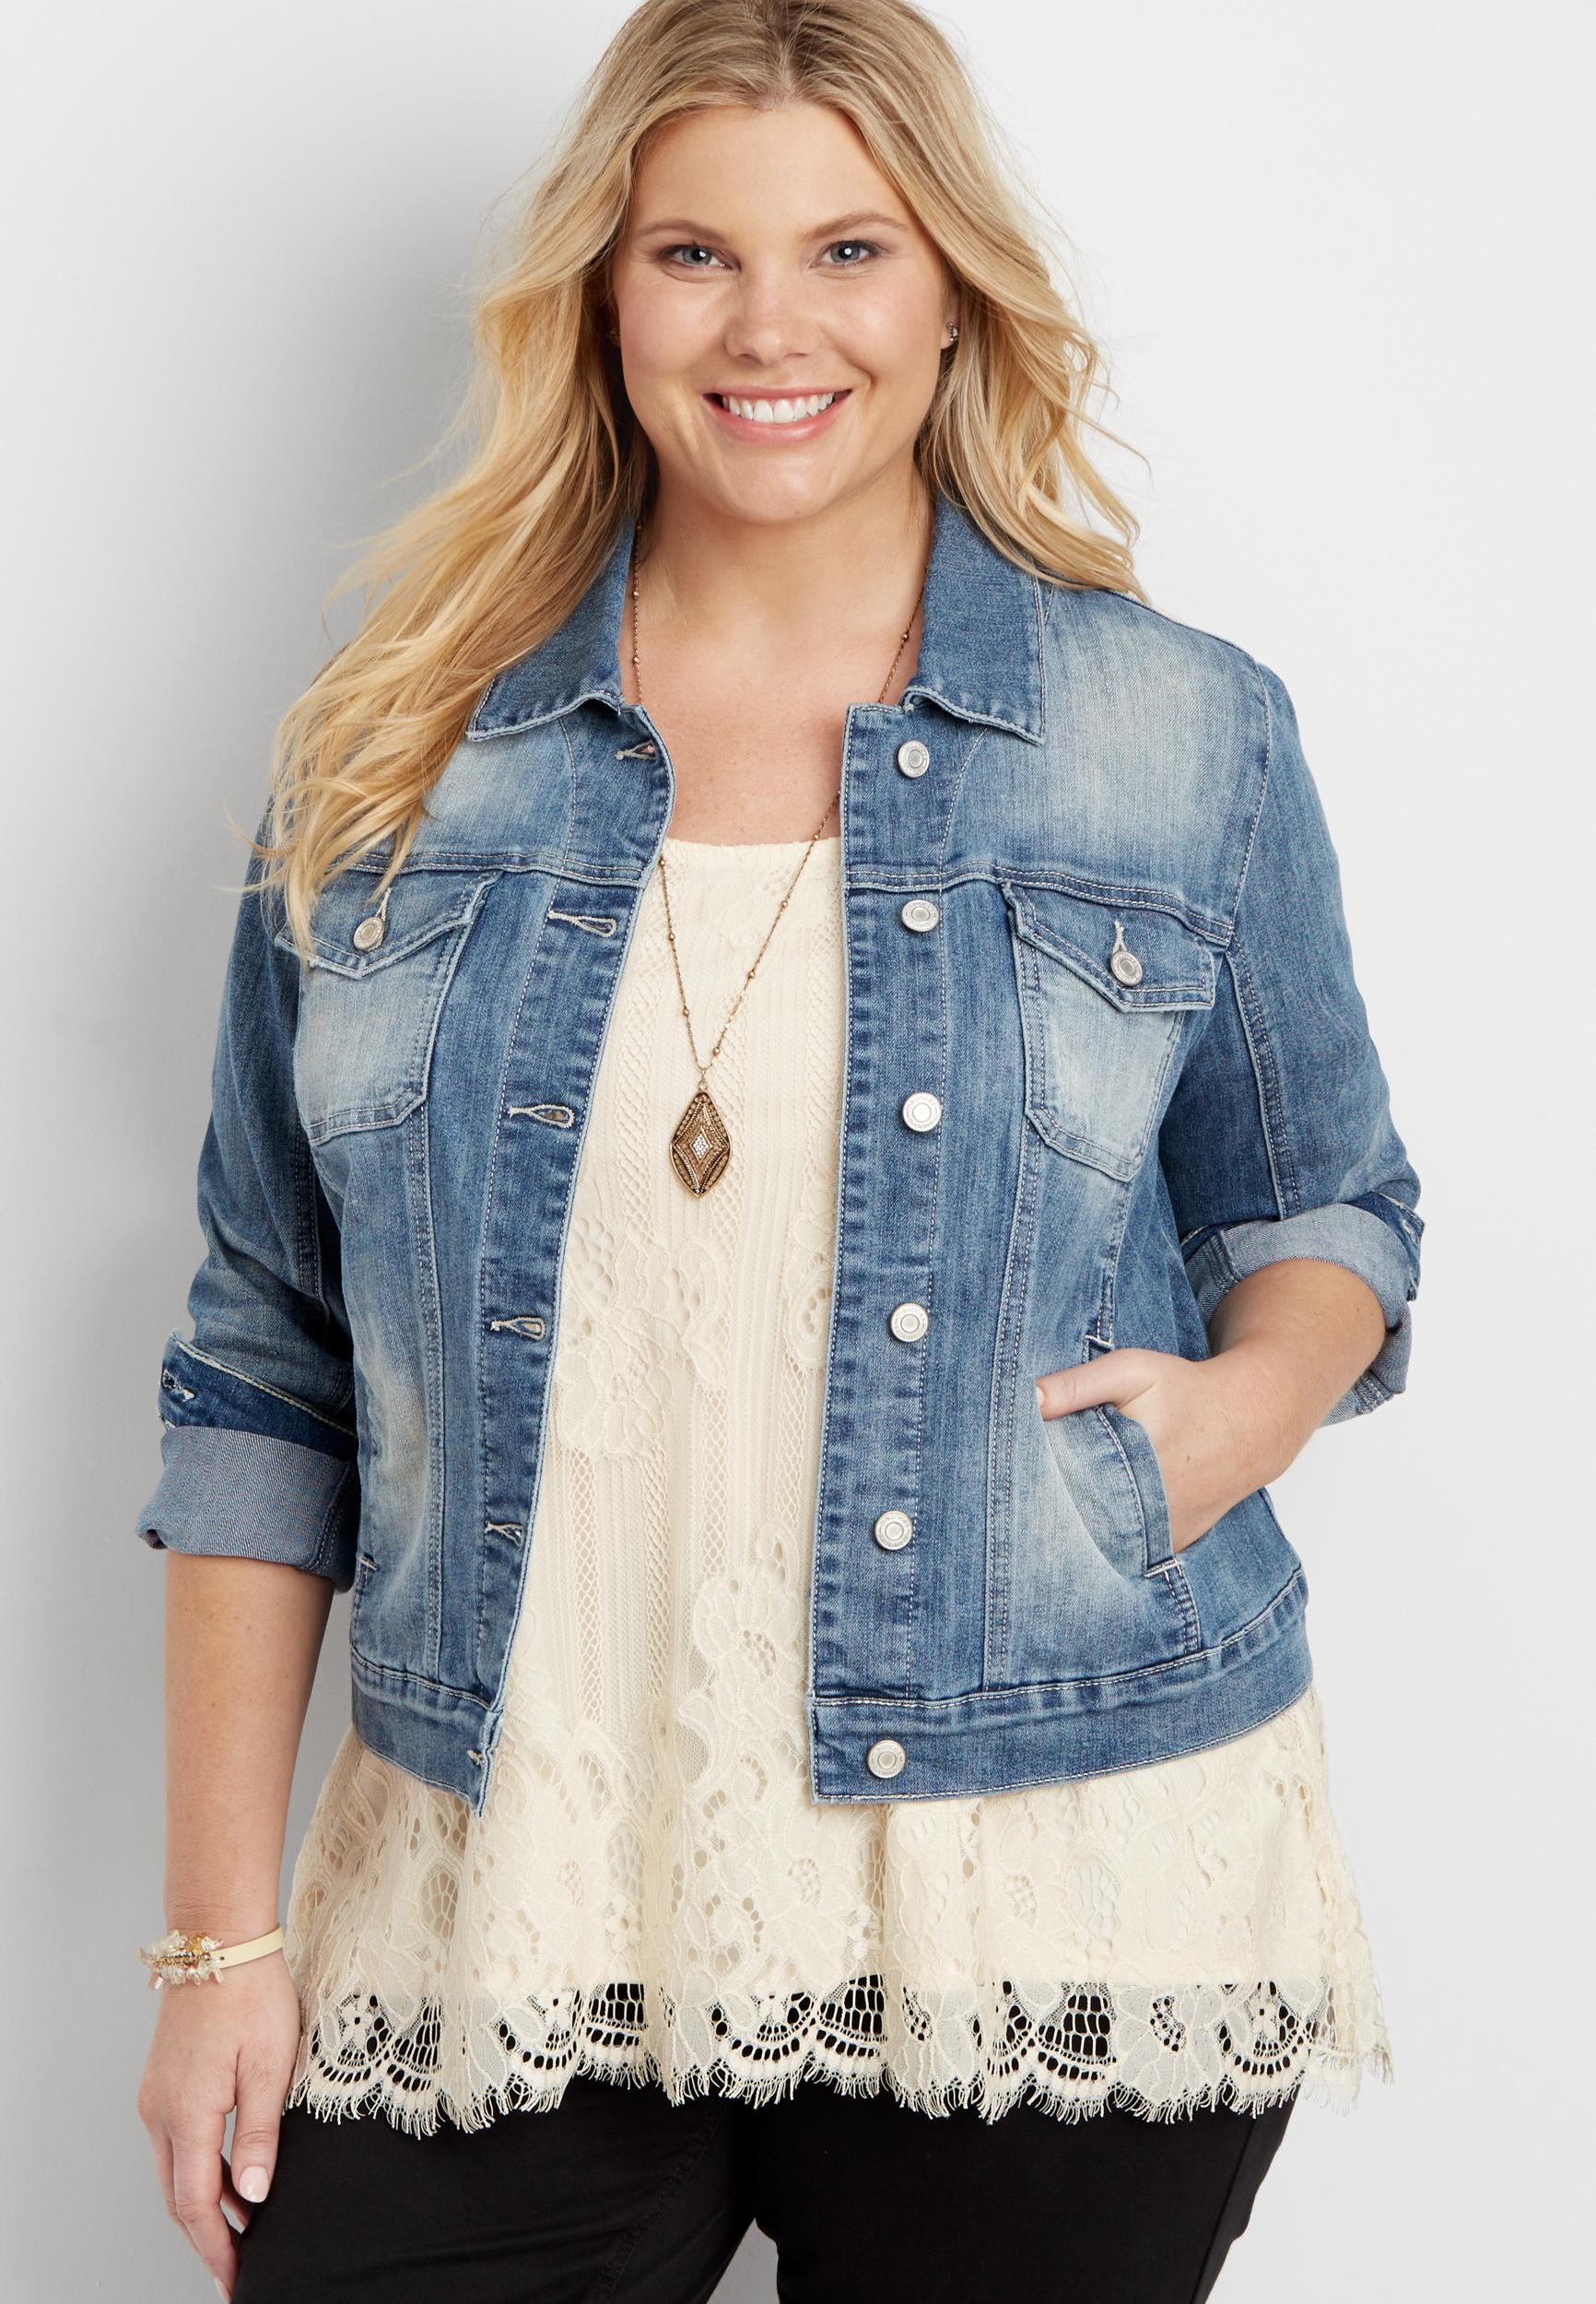 cc63c33d plus size denim jacket in sandblasted light wash | maurices